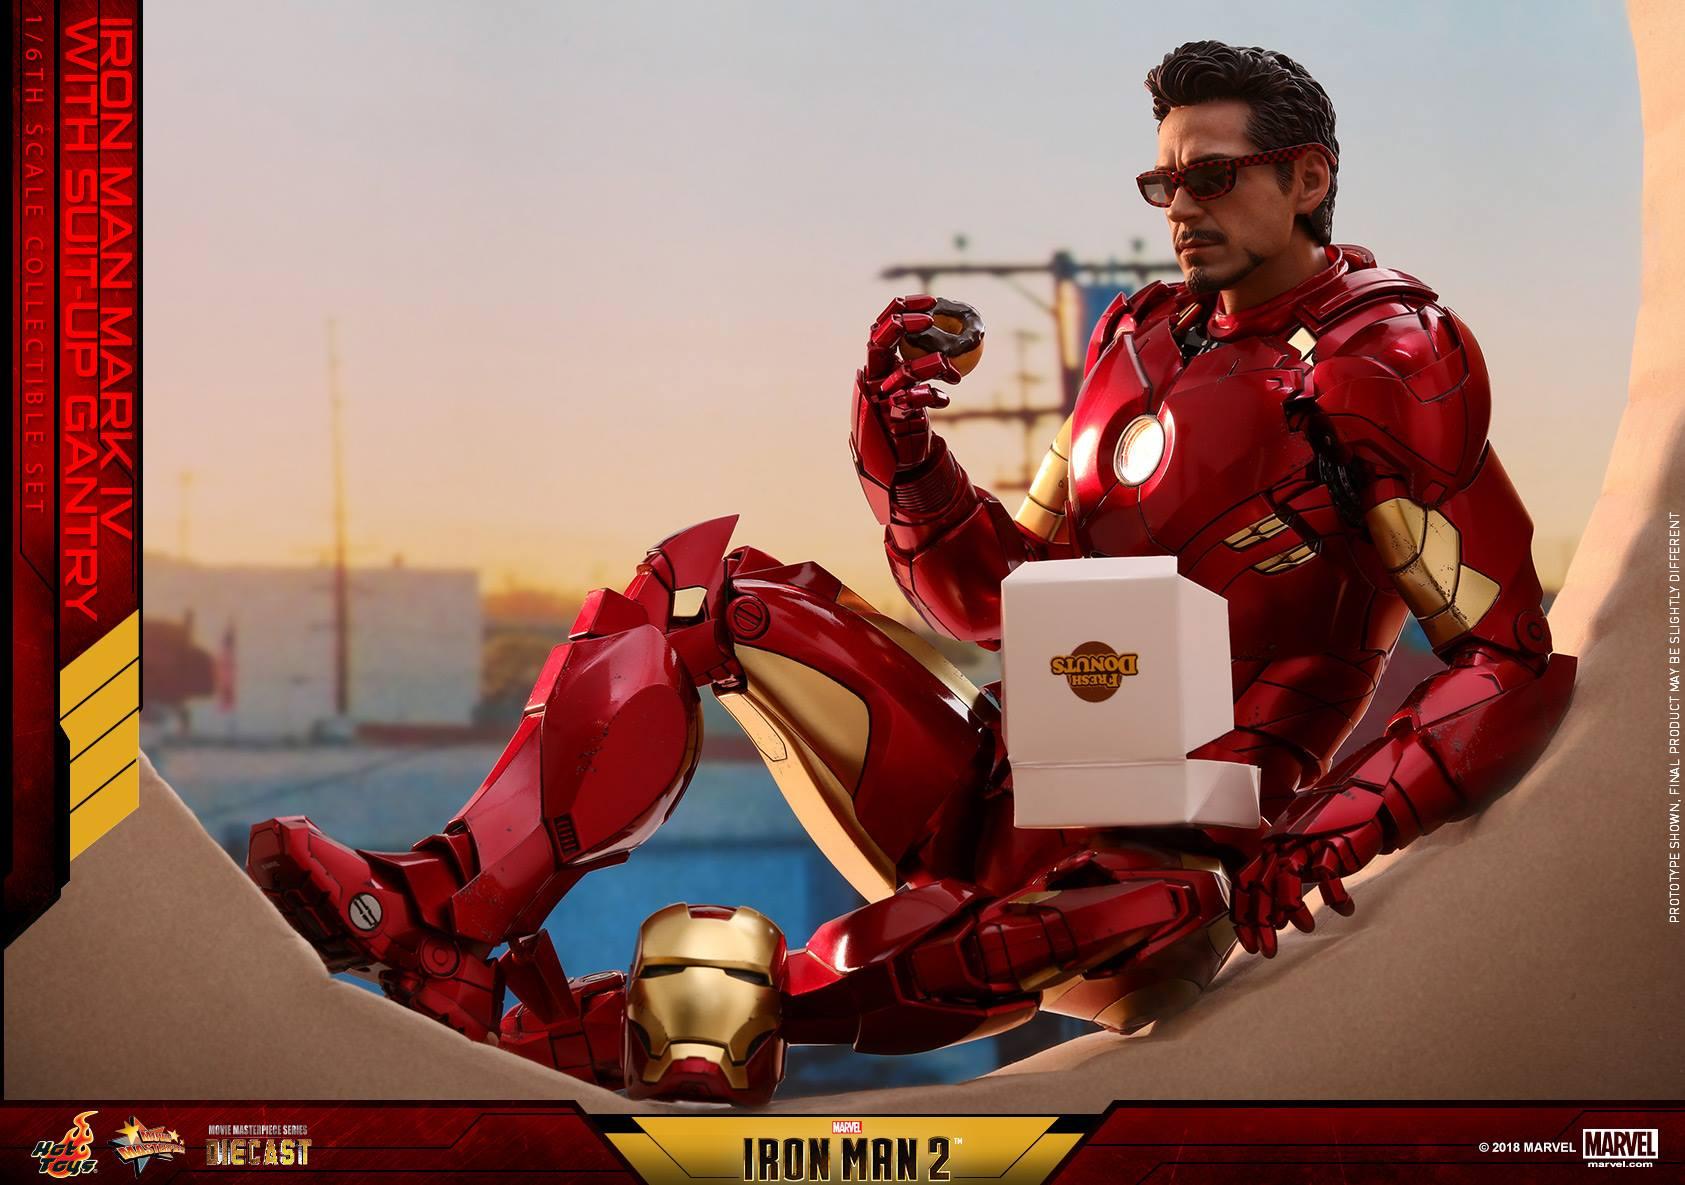 Hot-Toys-Iron-Man-MKIV-with-Gantry-017